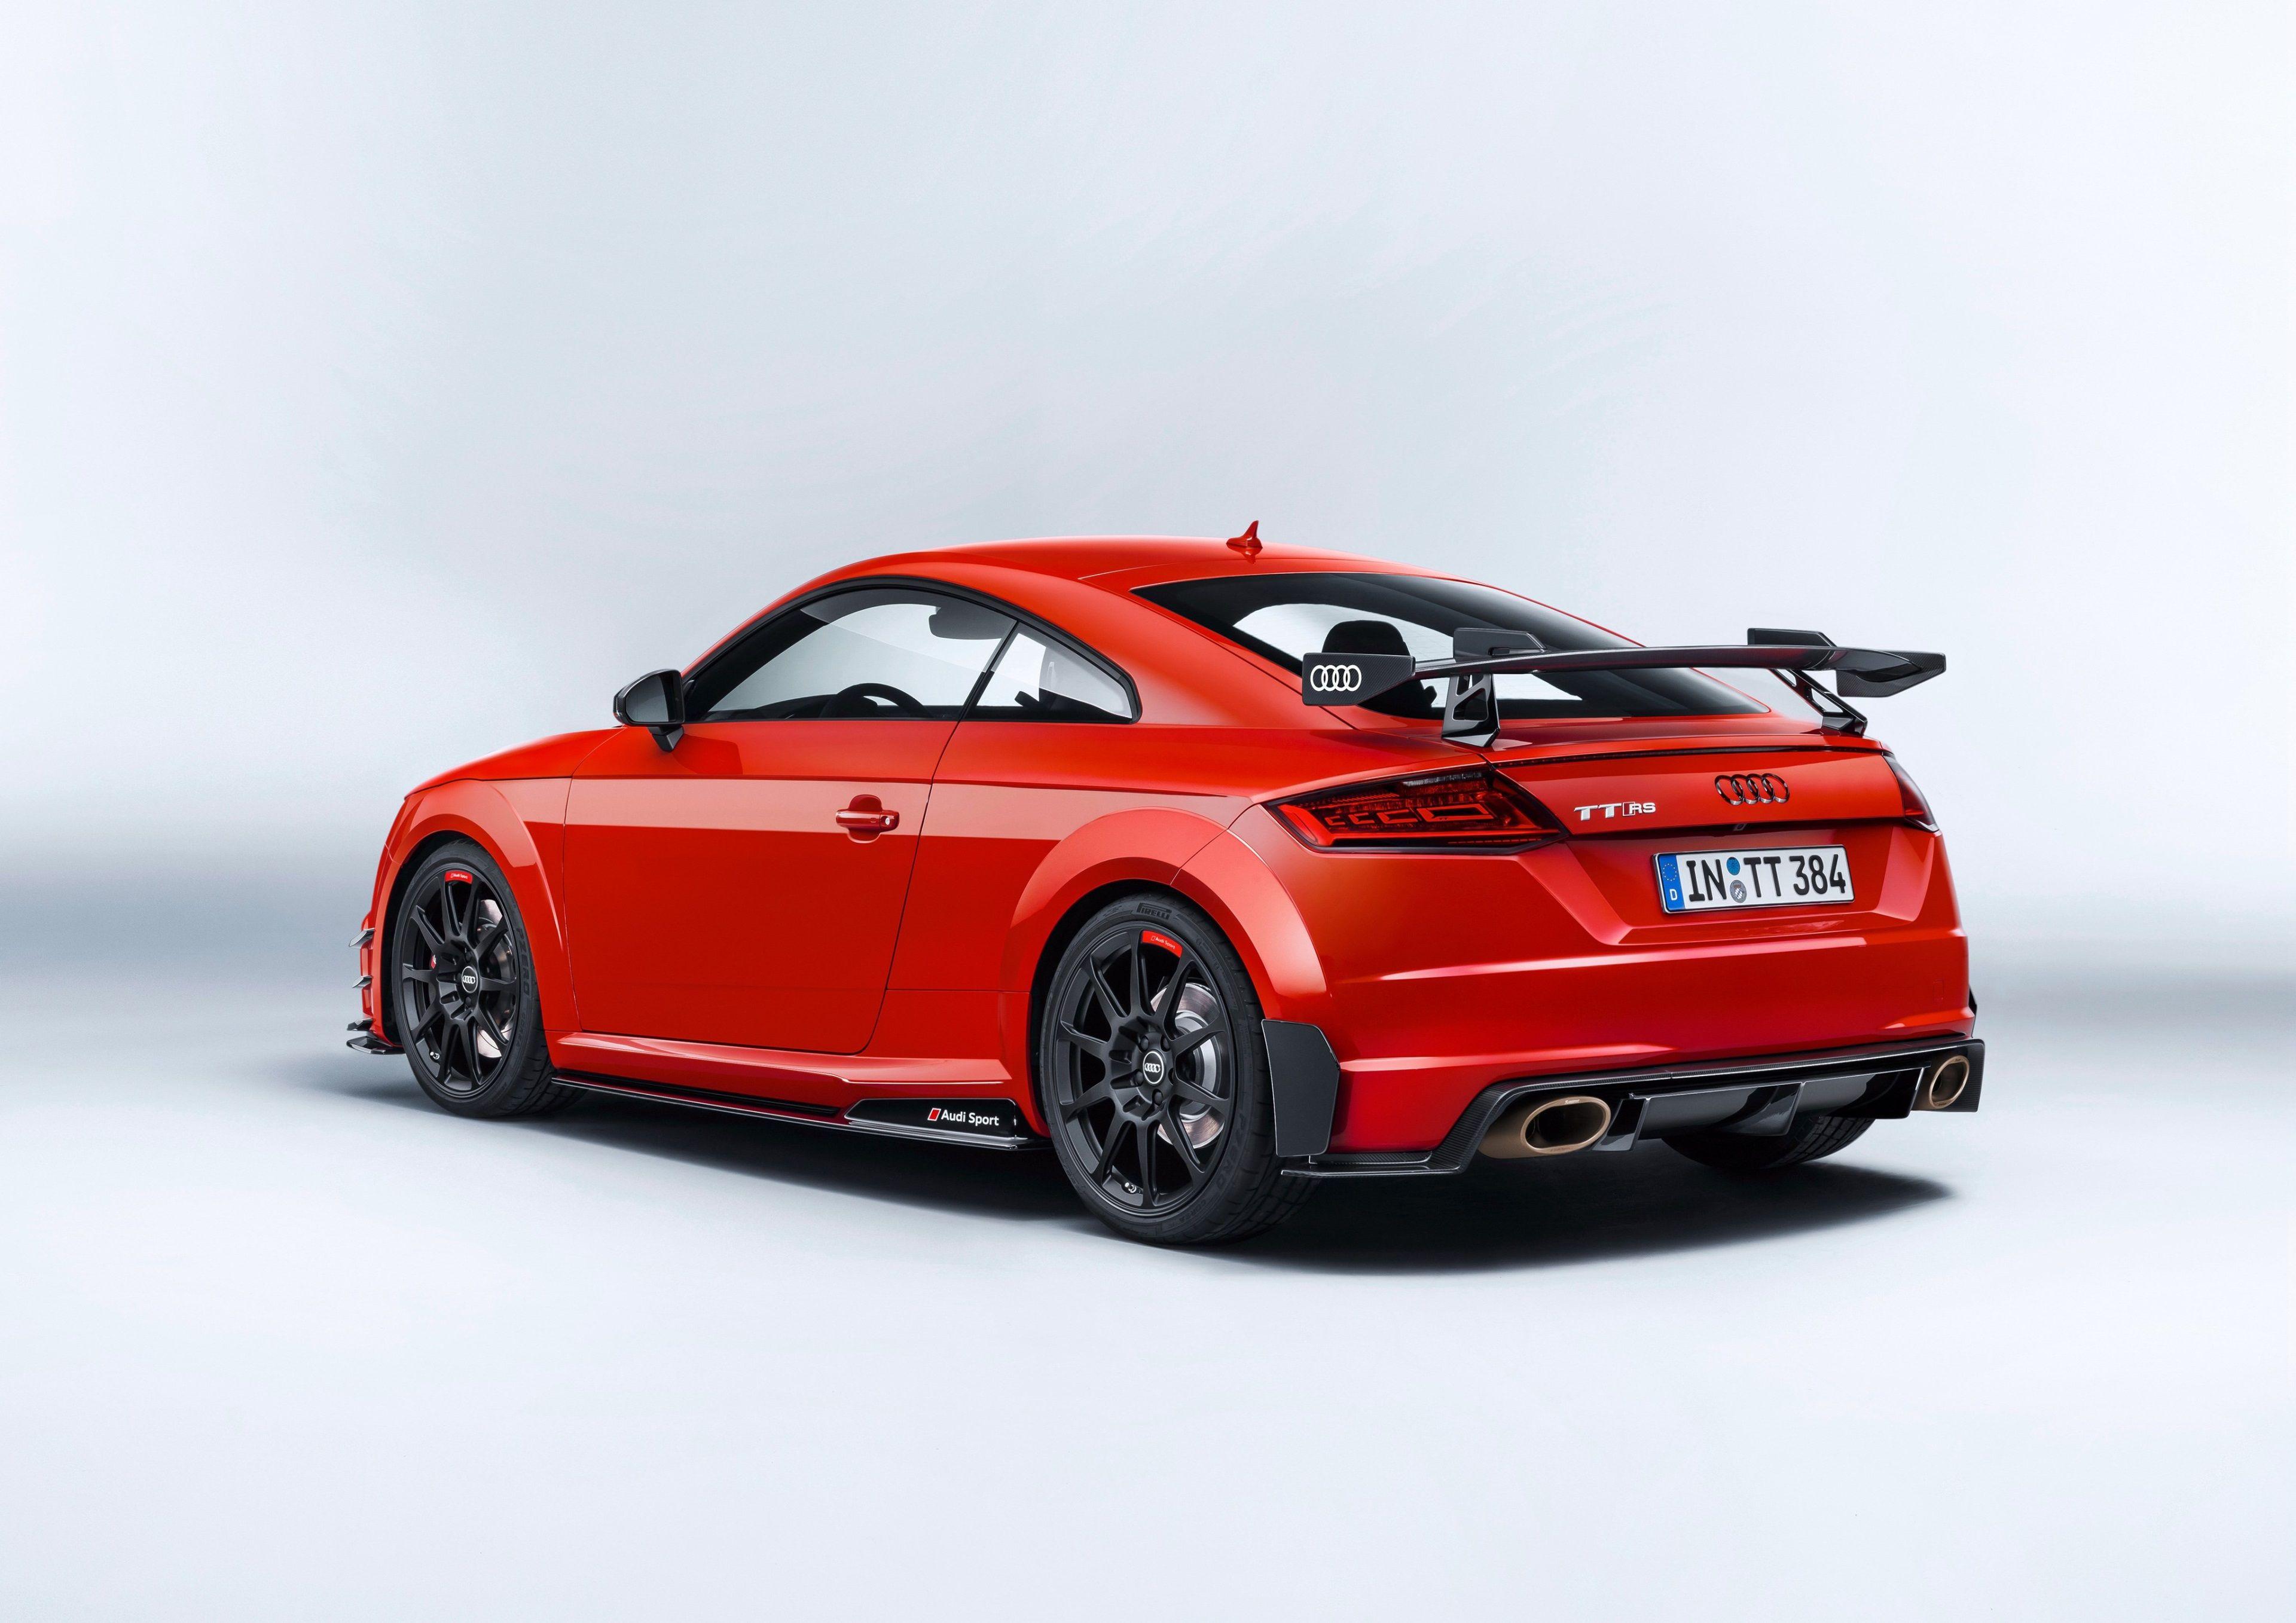 3840x2715 audi tt 4k hd wallpaper for desktop wallpapers and rh pinterest com 2016 Audi TT Coupe 2005 Audi TT Coupe